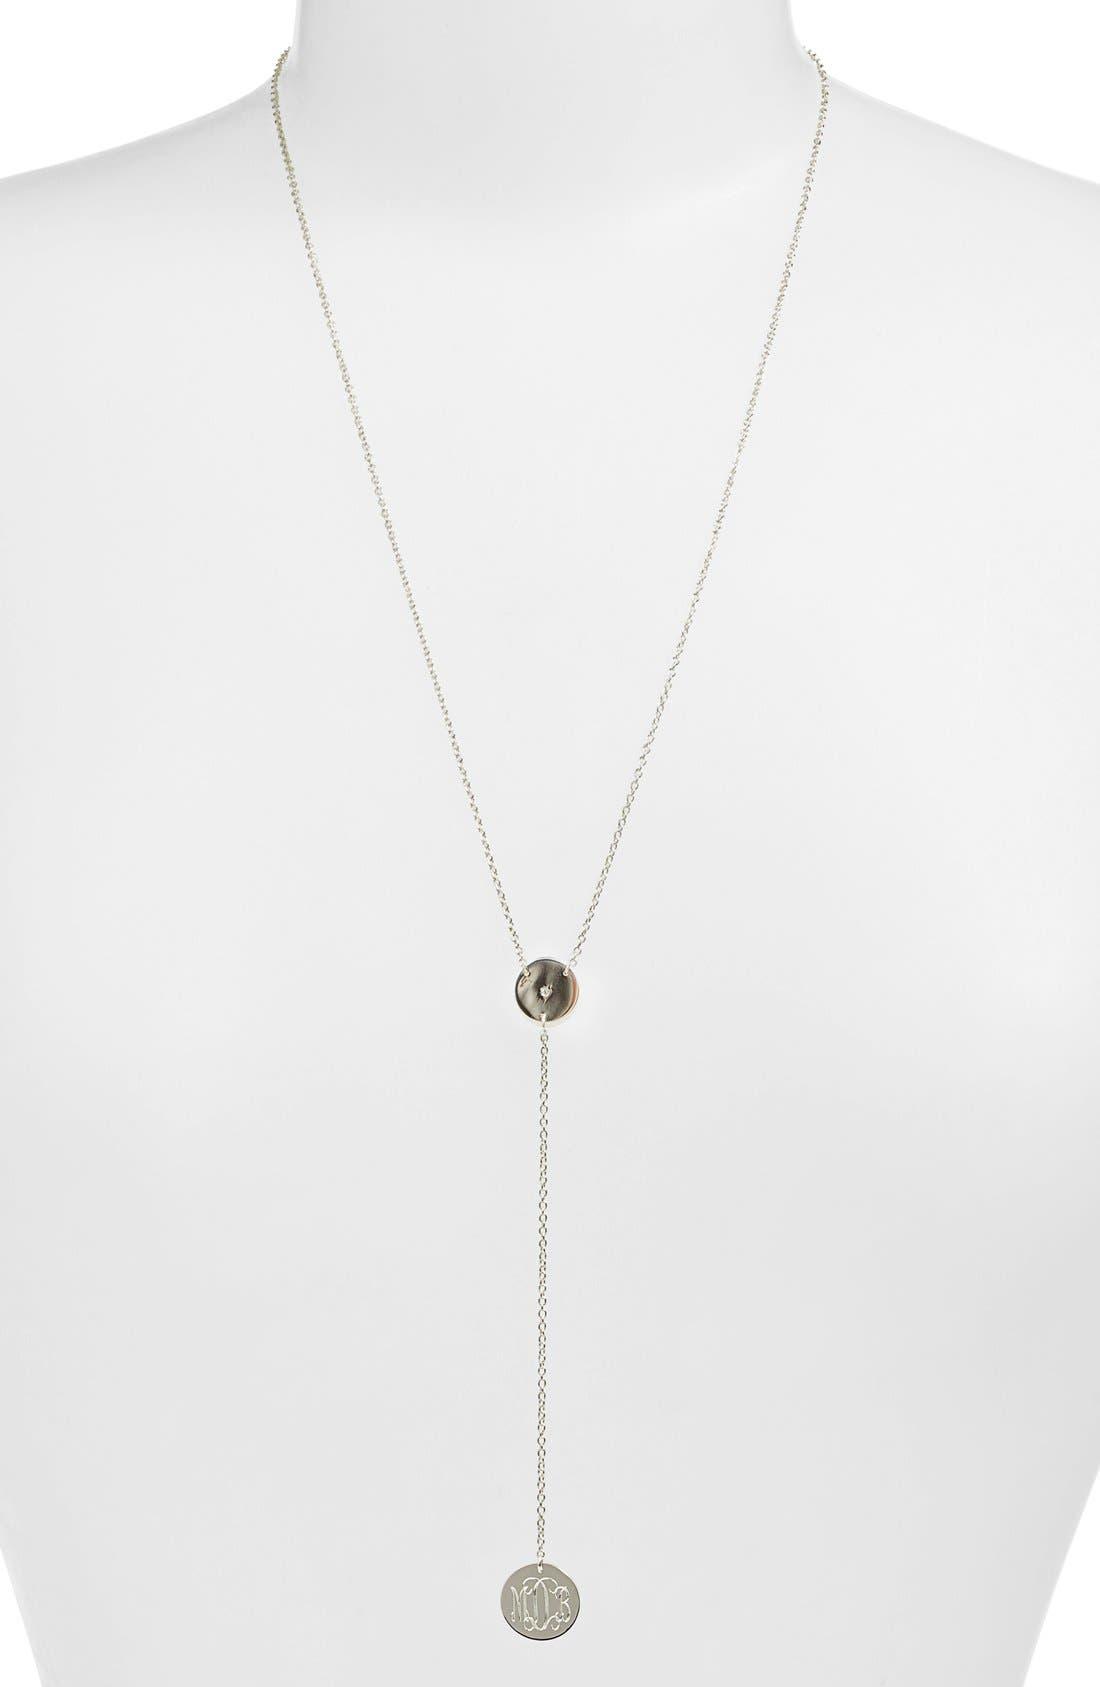 Diamond & Personalized Monogram Y-Necklace,                             Alternate thumbnail 8, color,